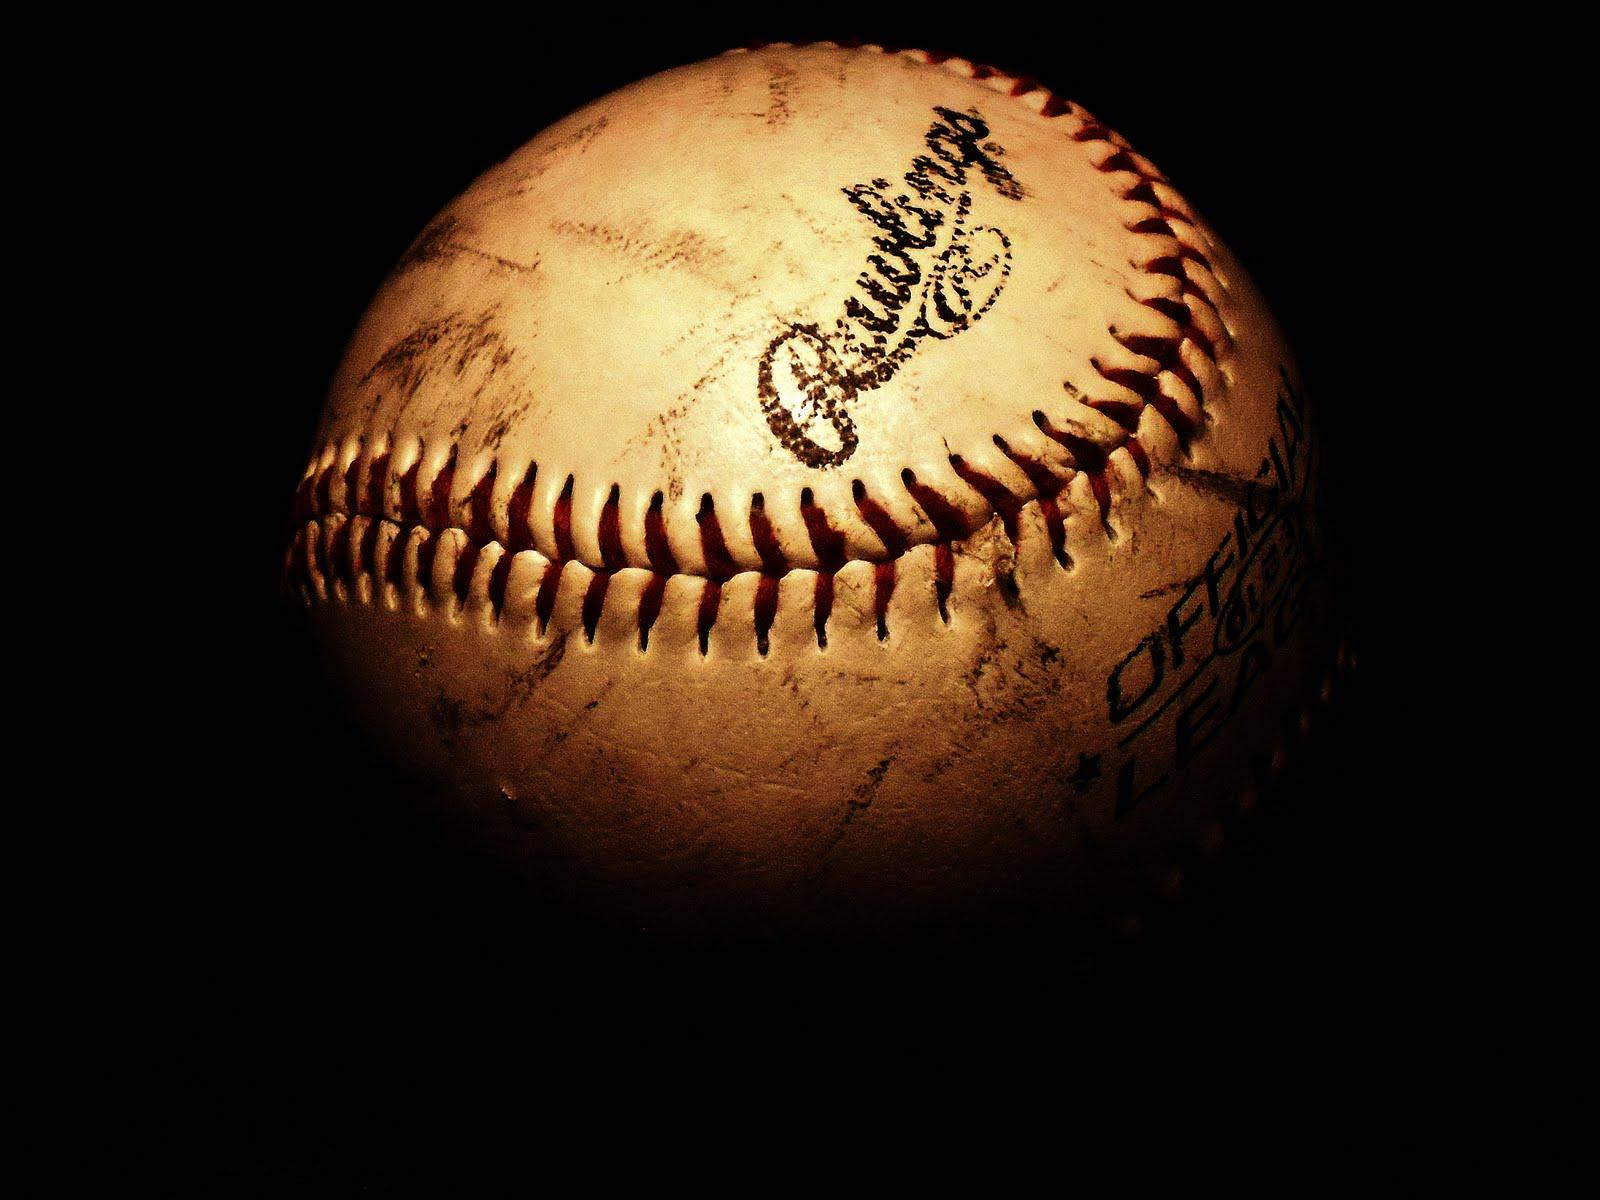 Baseball 745338 1600x1200px by Josh McGrotty 1600x1200